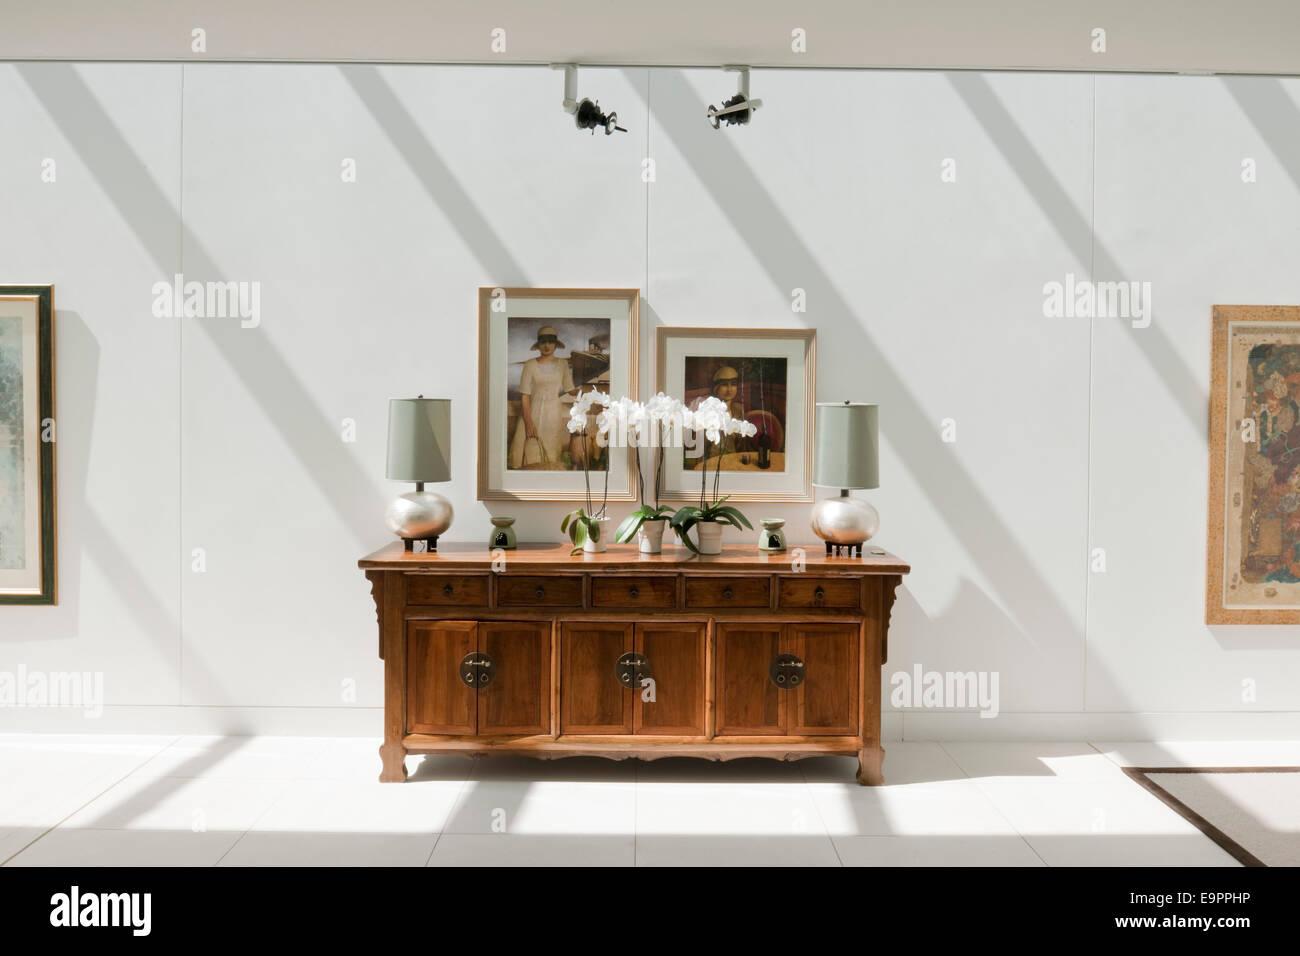 Framed Prints Stock Photos & Framed Prints Stock Images - Alamy